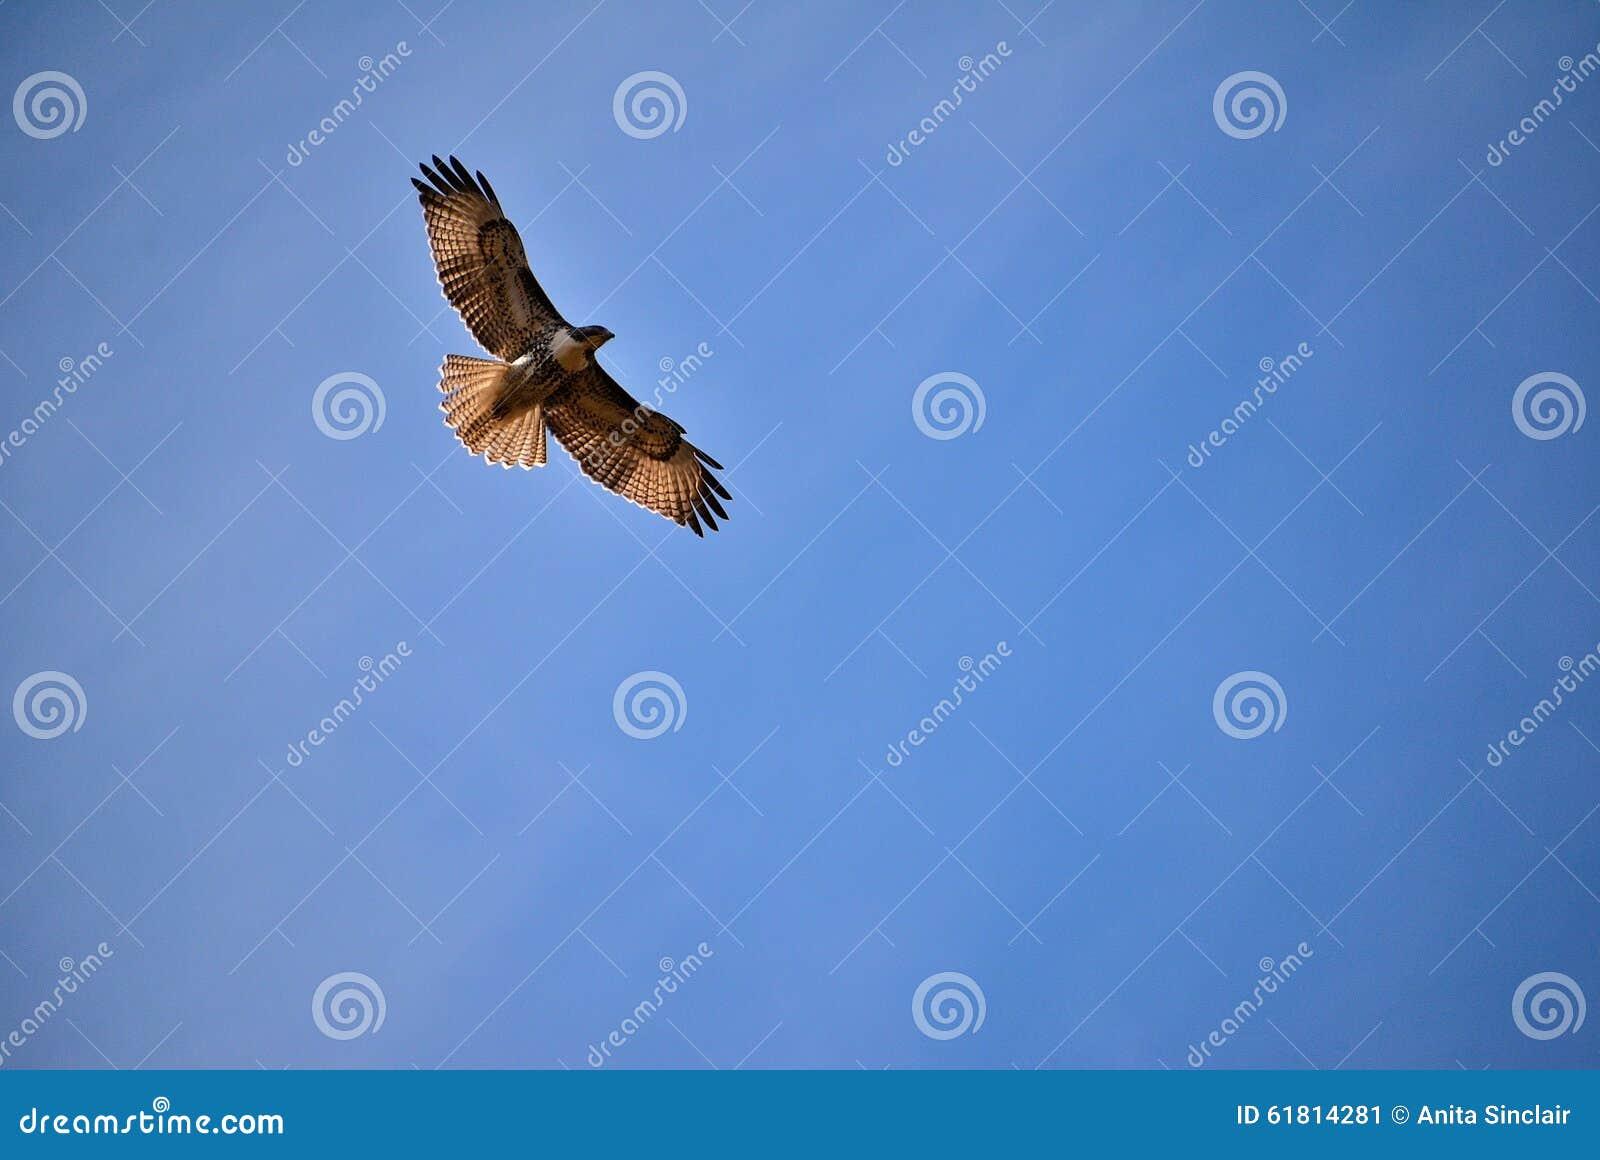 Парящий хоук против голубого неба